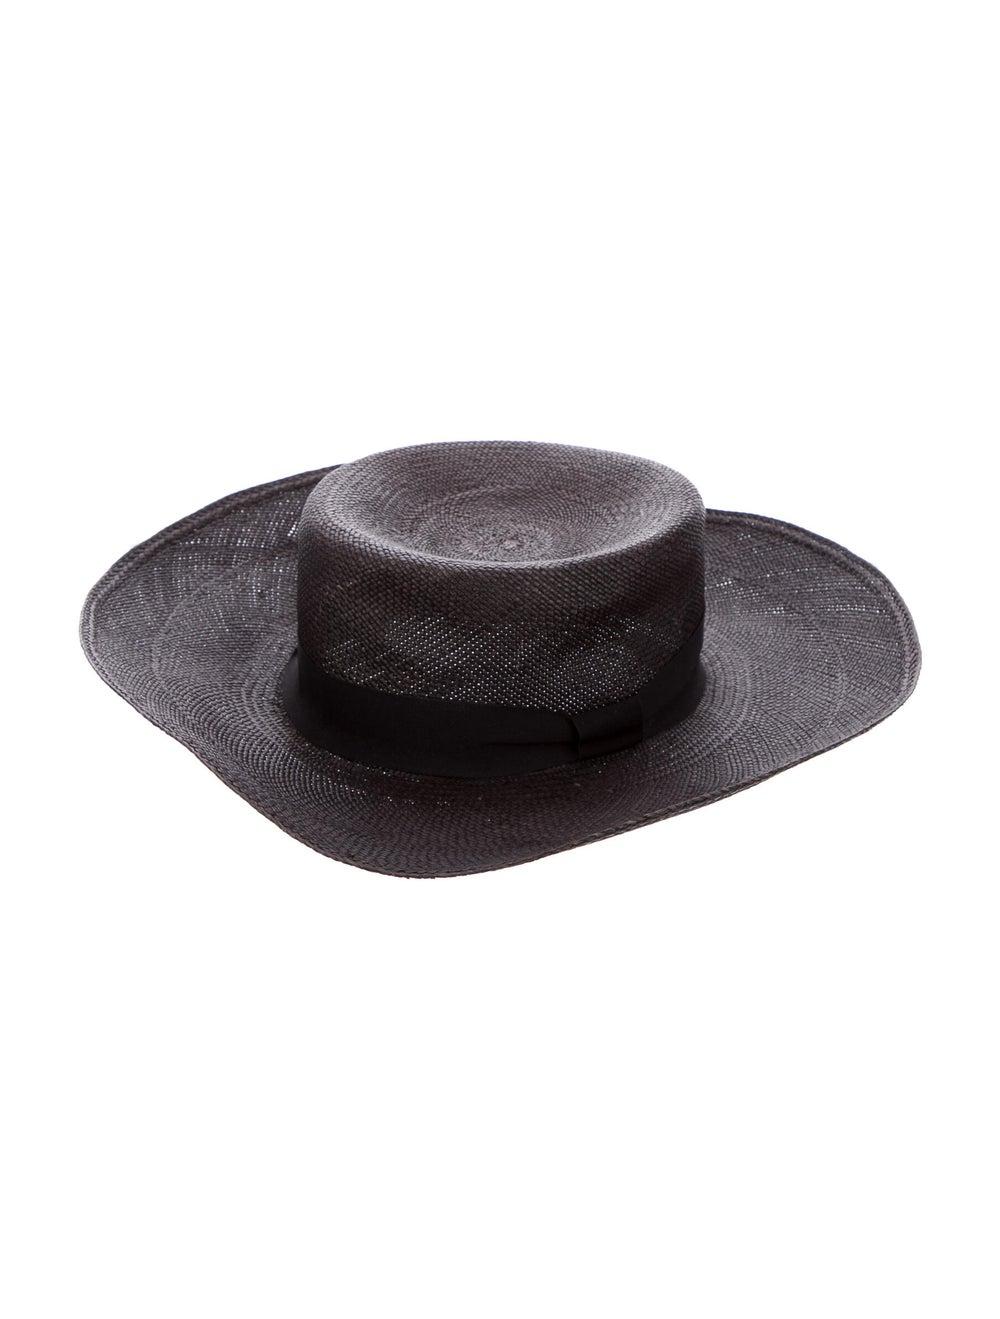 Sensi Studio Straw Wide Brim Hat Black - image 1